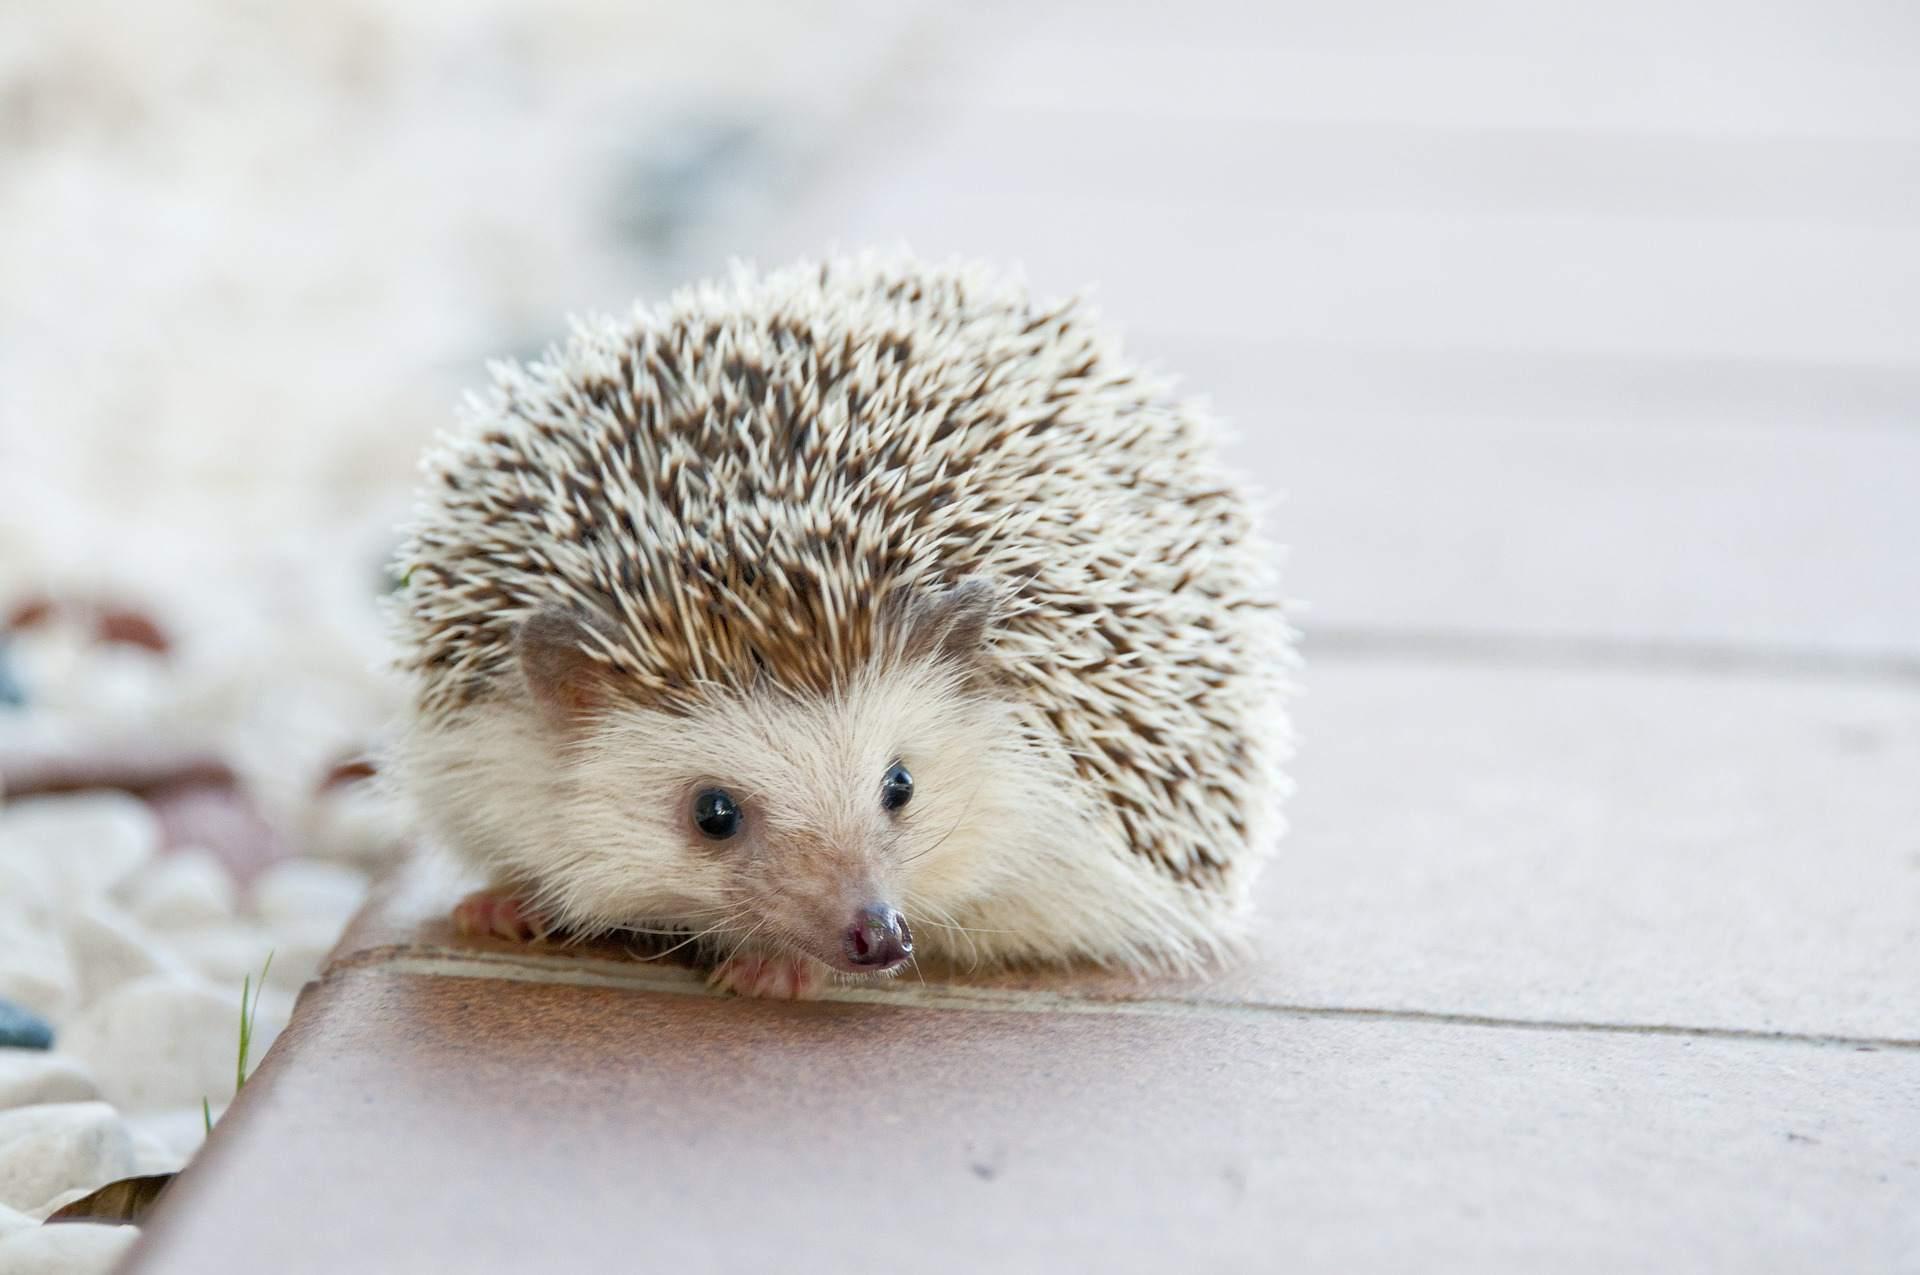 Hedgehog curled up on a brick walkway.